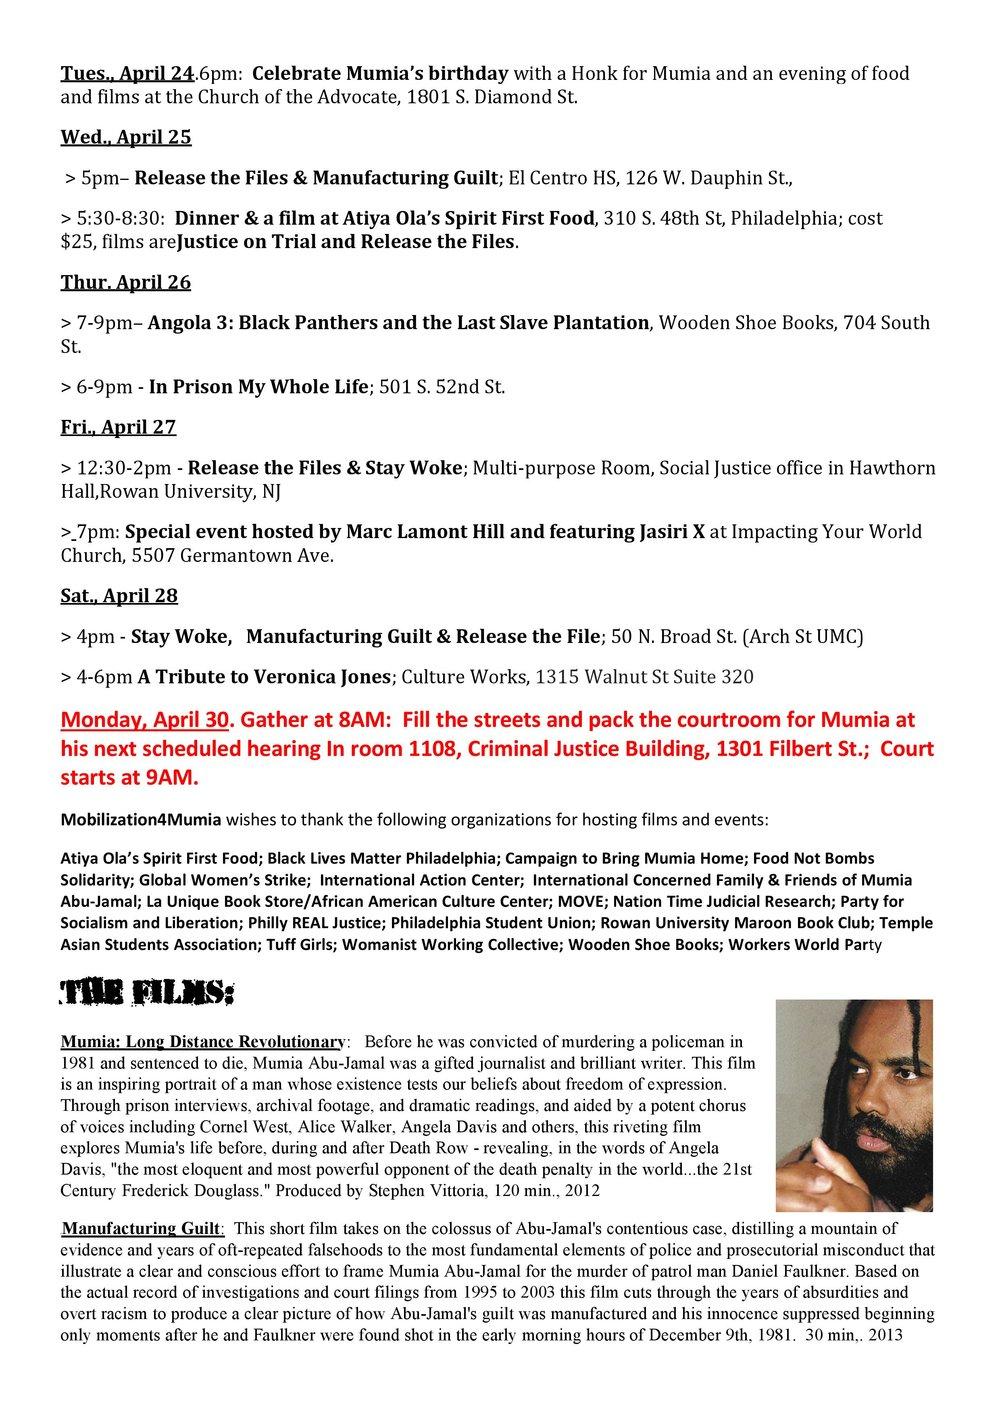 FREEMUMIAFILMFESTIVAL  FLIER DOC-page-002.jpg